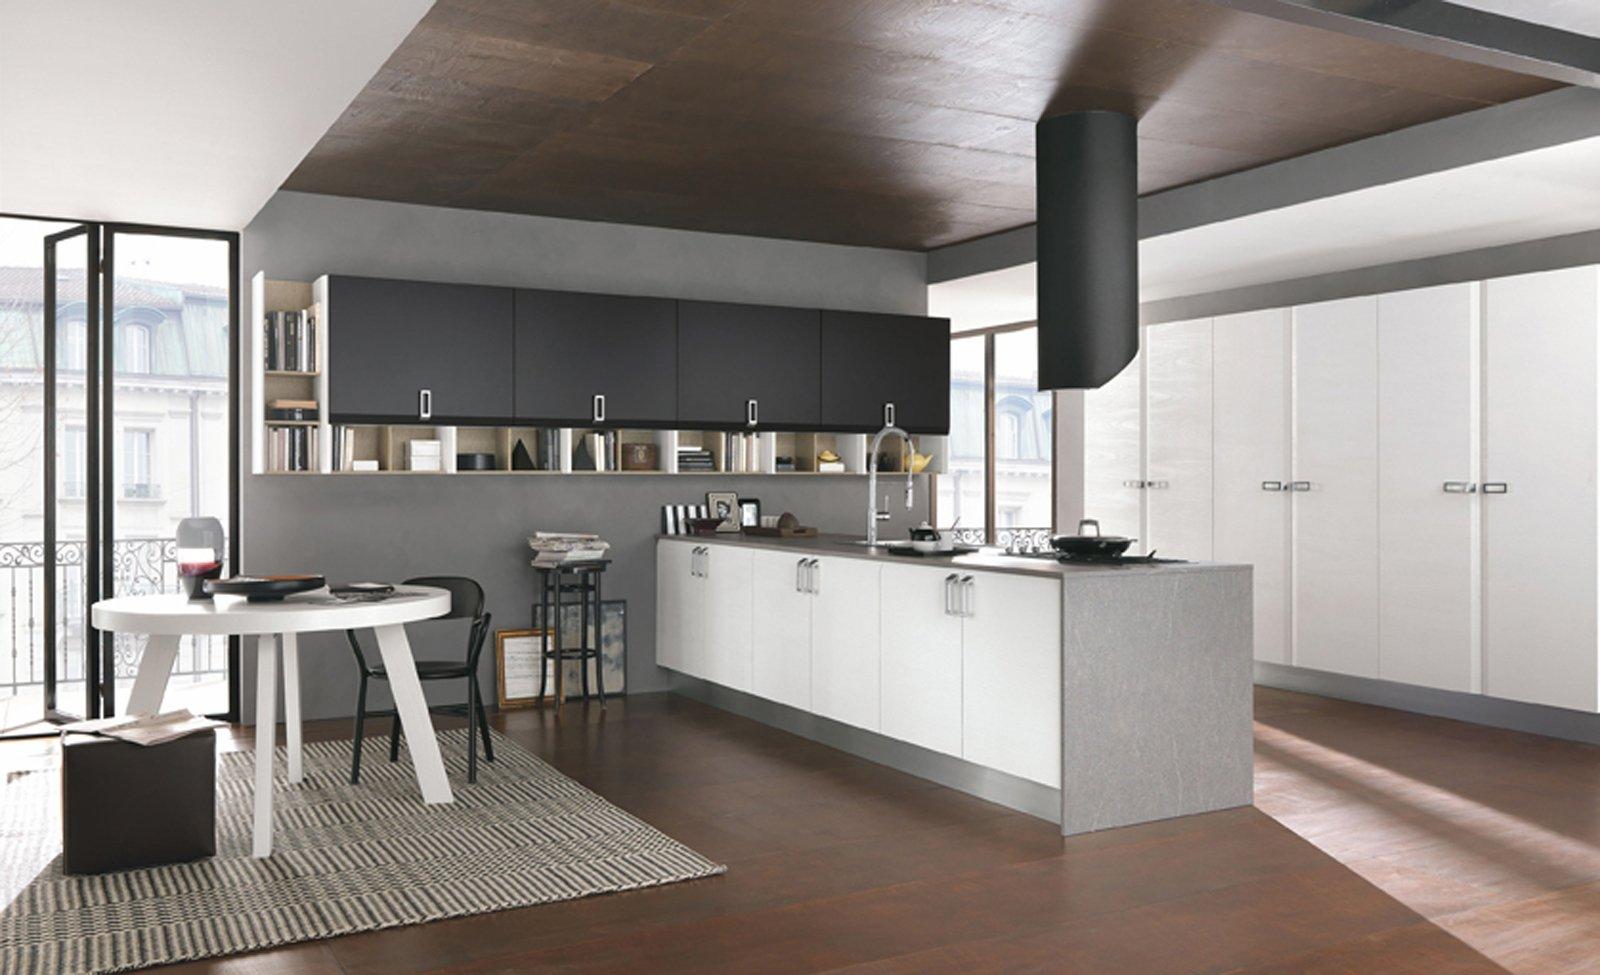 Cucine con penisola cose di casa - Sgabelli per cucina moderna ...